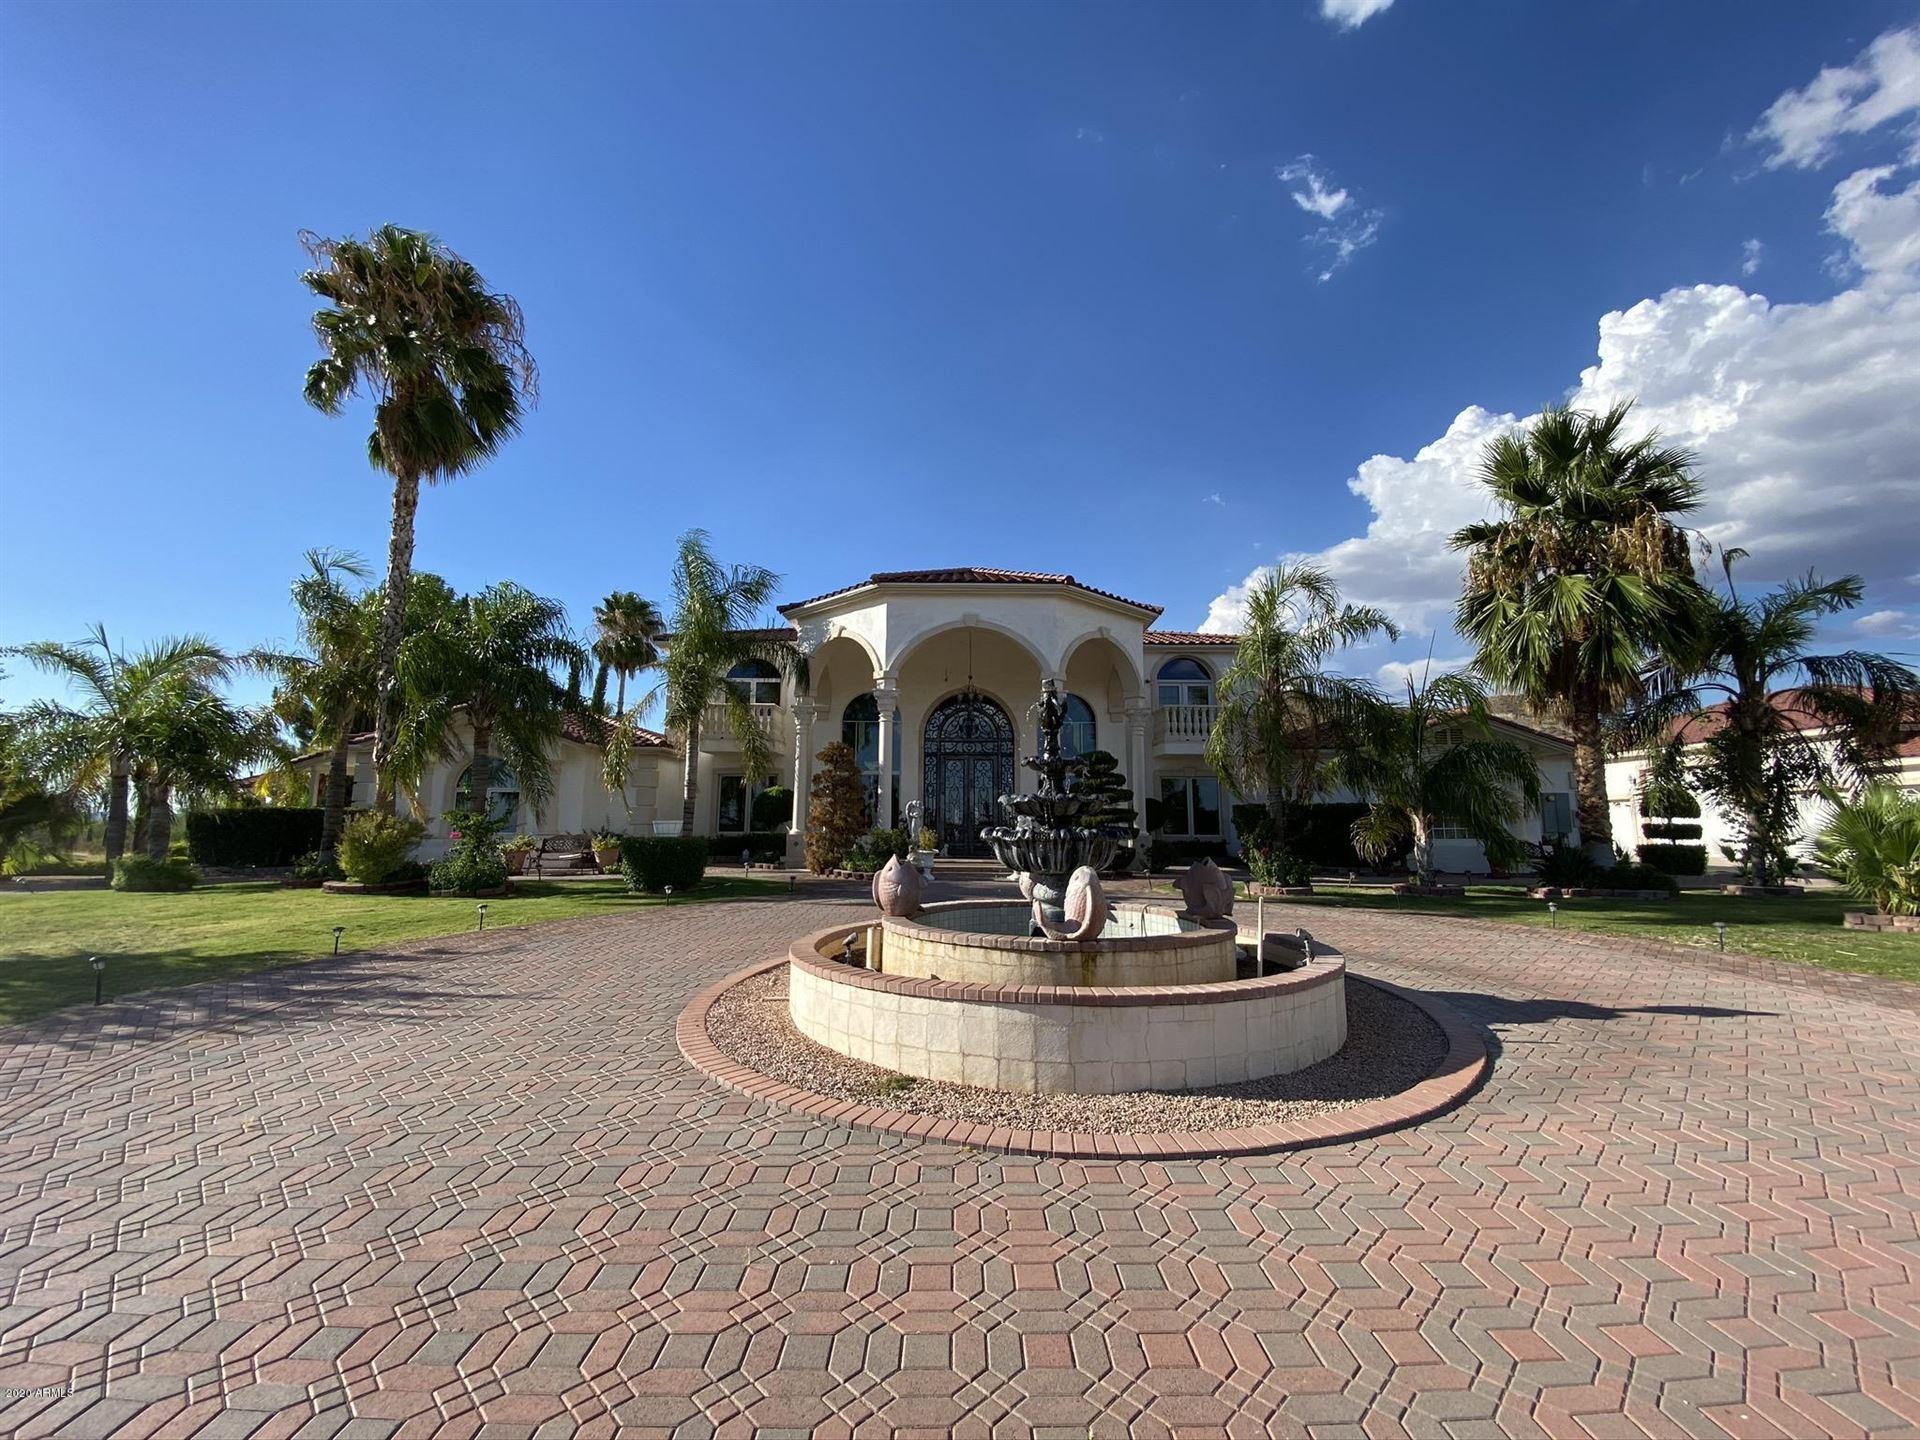 8514 E OAK Street, Mesa, AZ 85207 - MLS#: 6111391